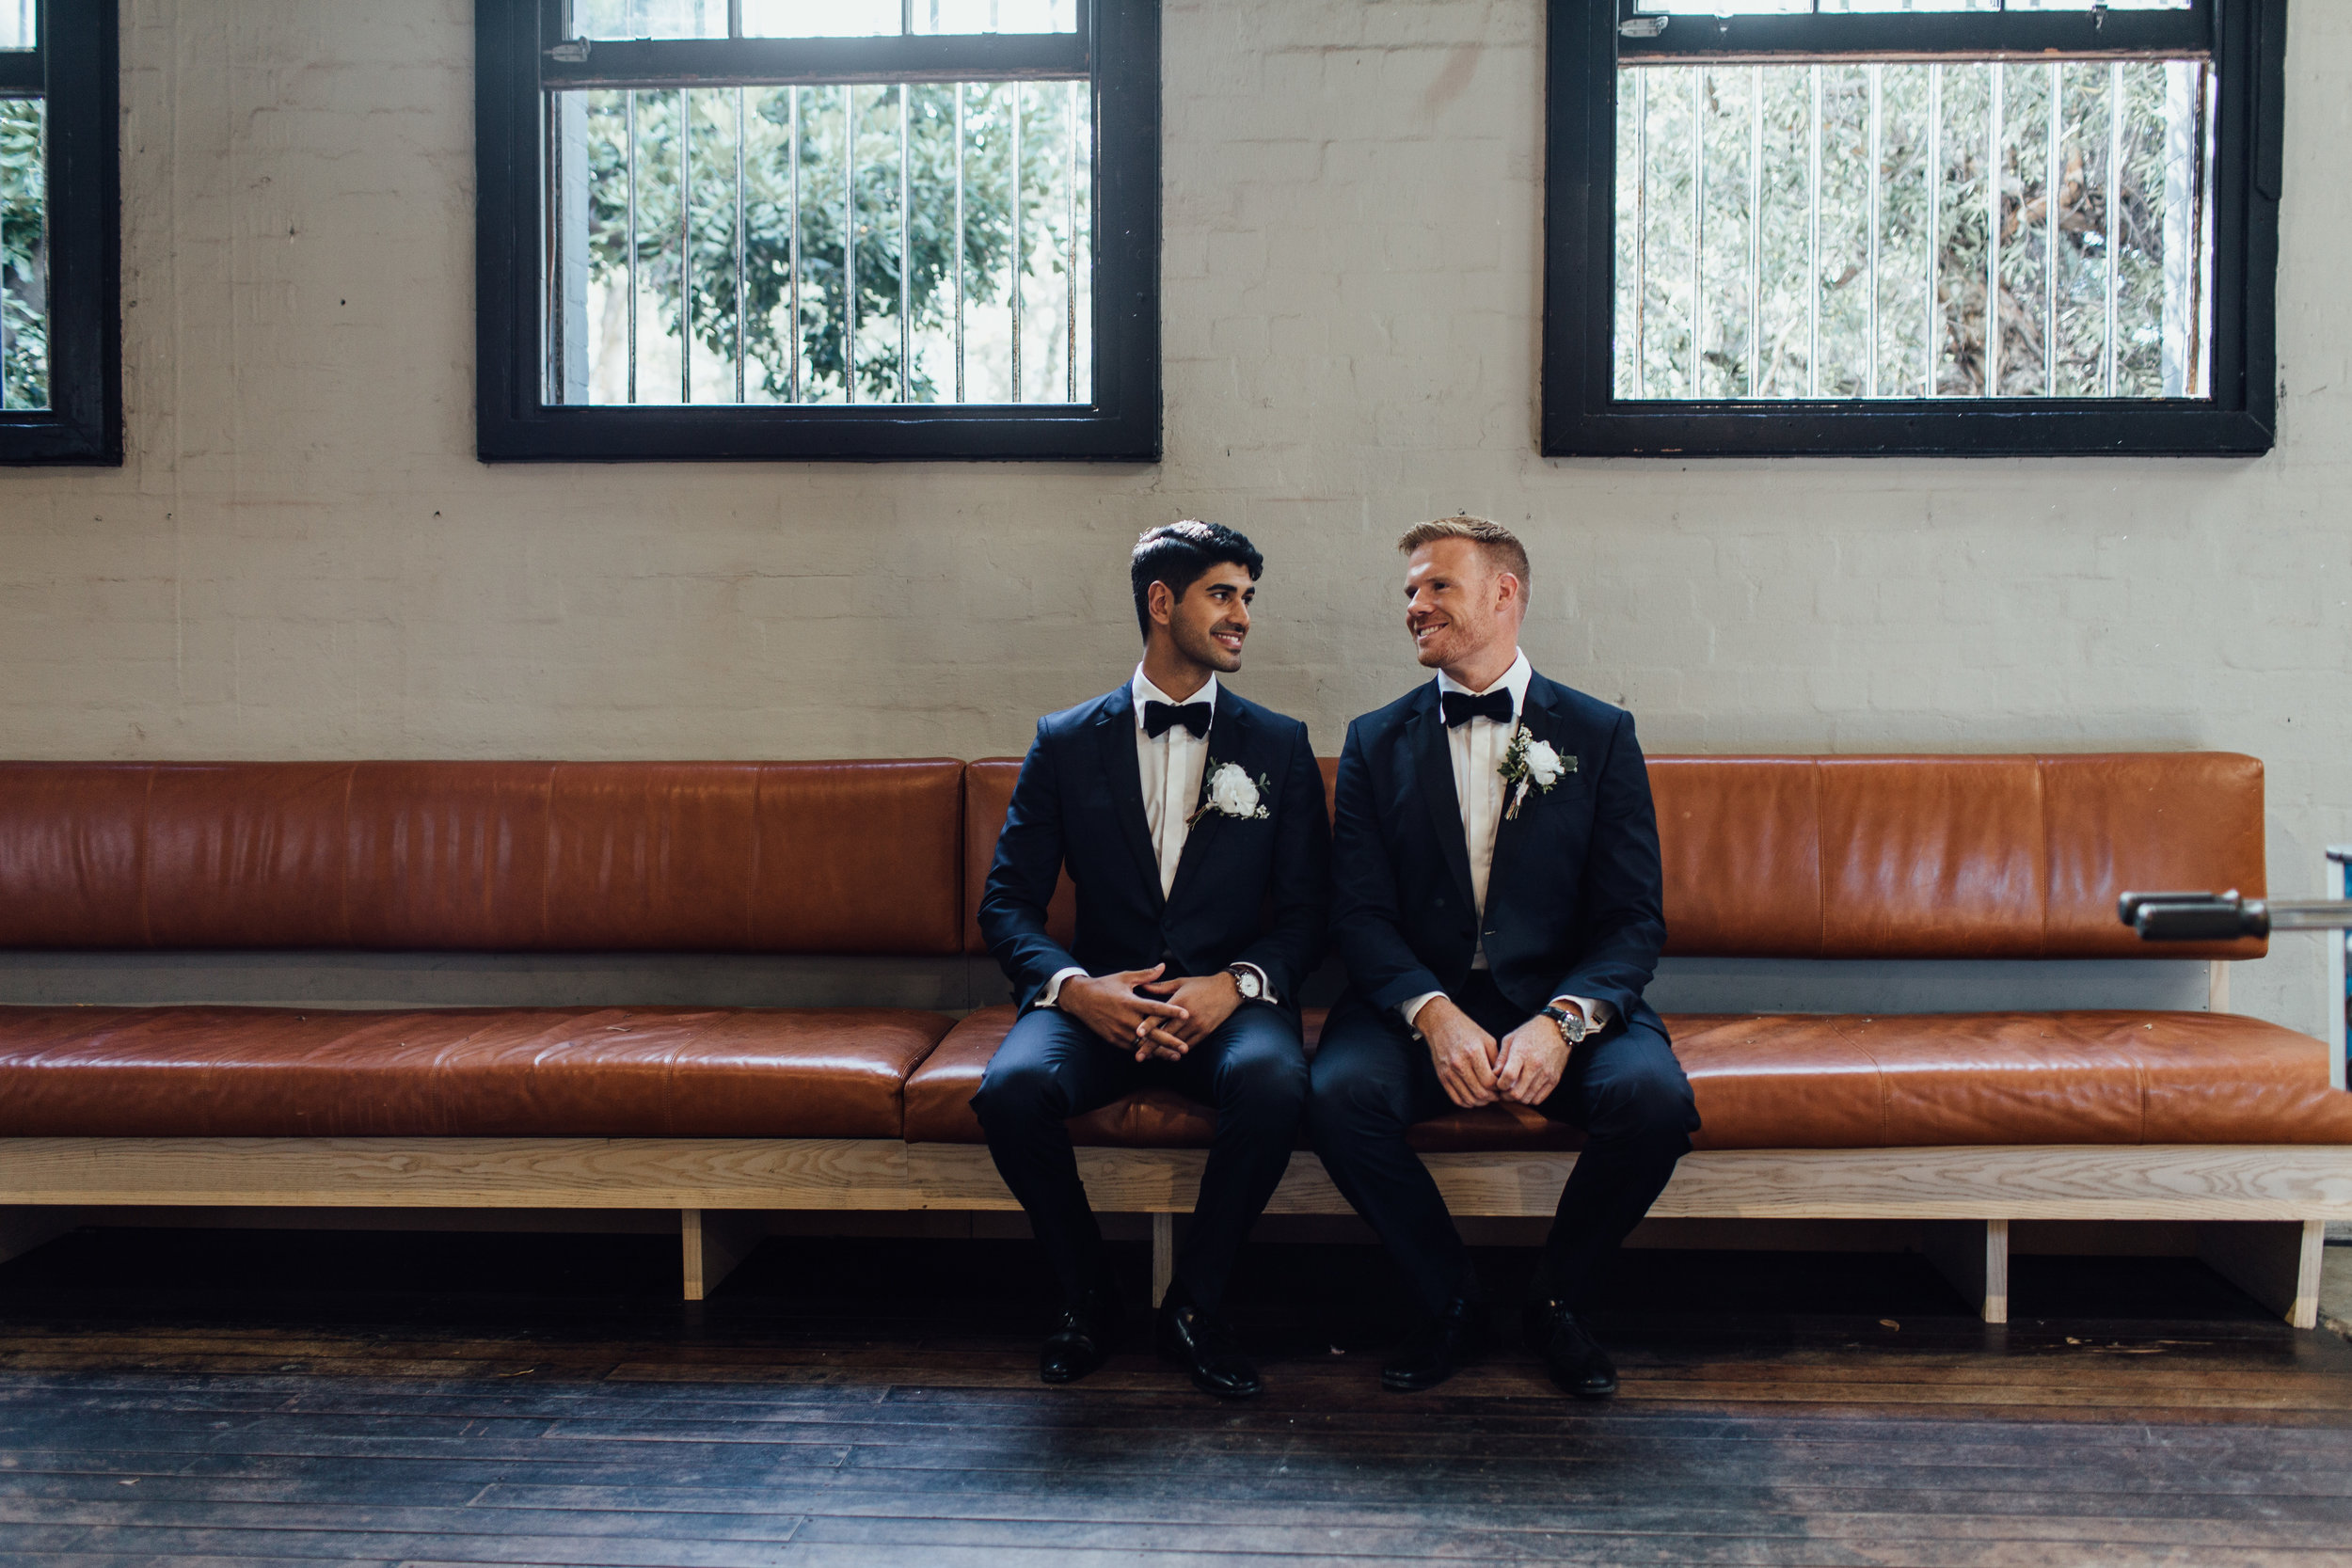 Stephen&David-Wedding-344.jpg